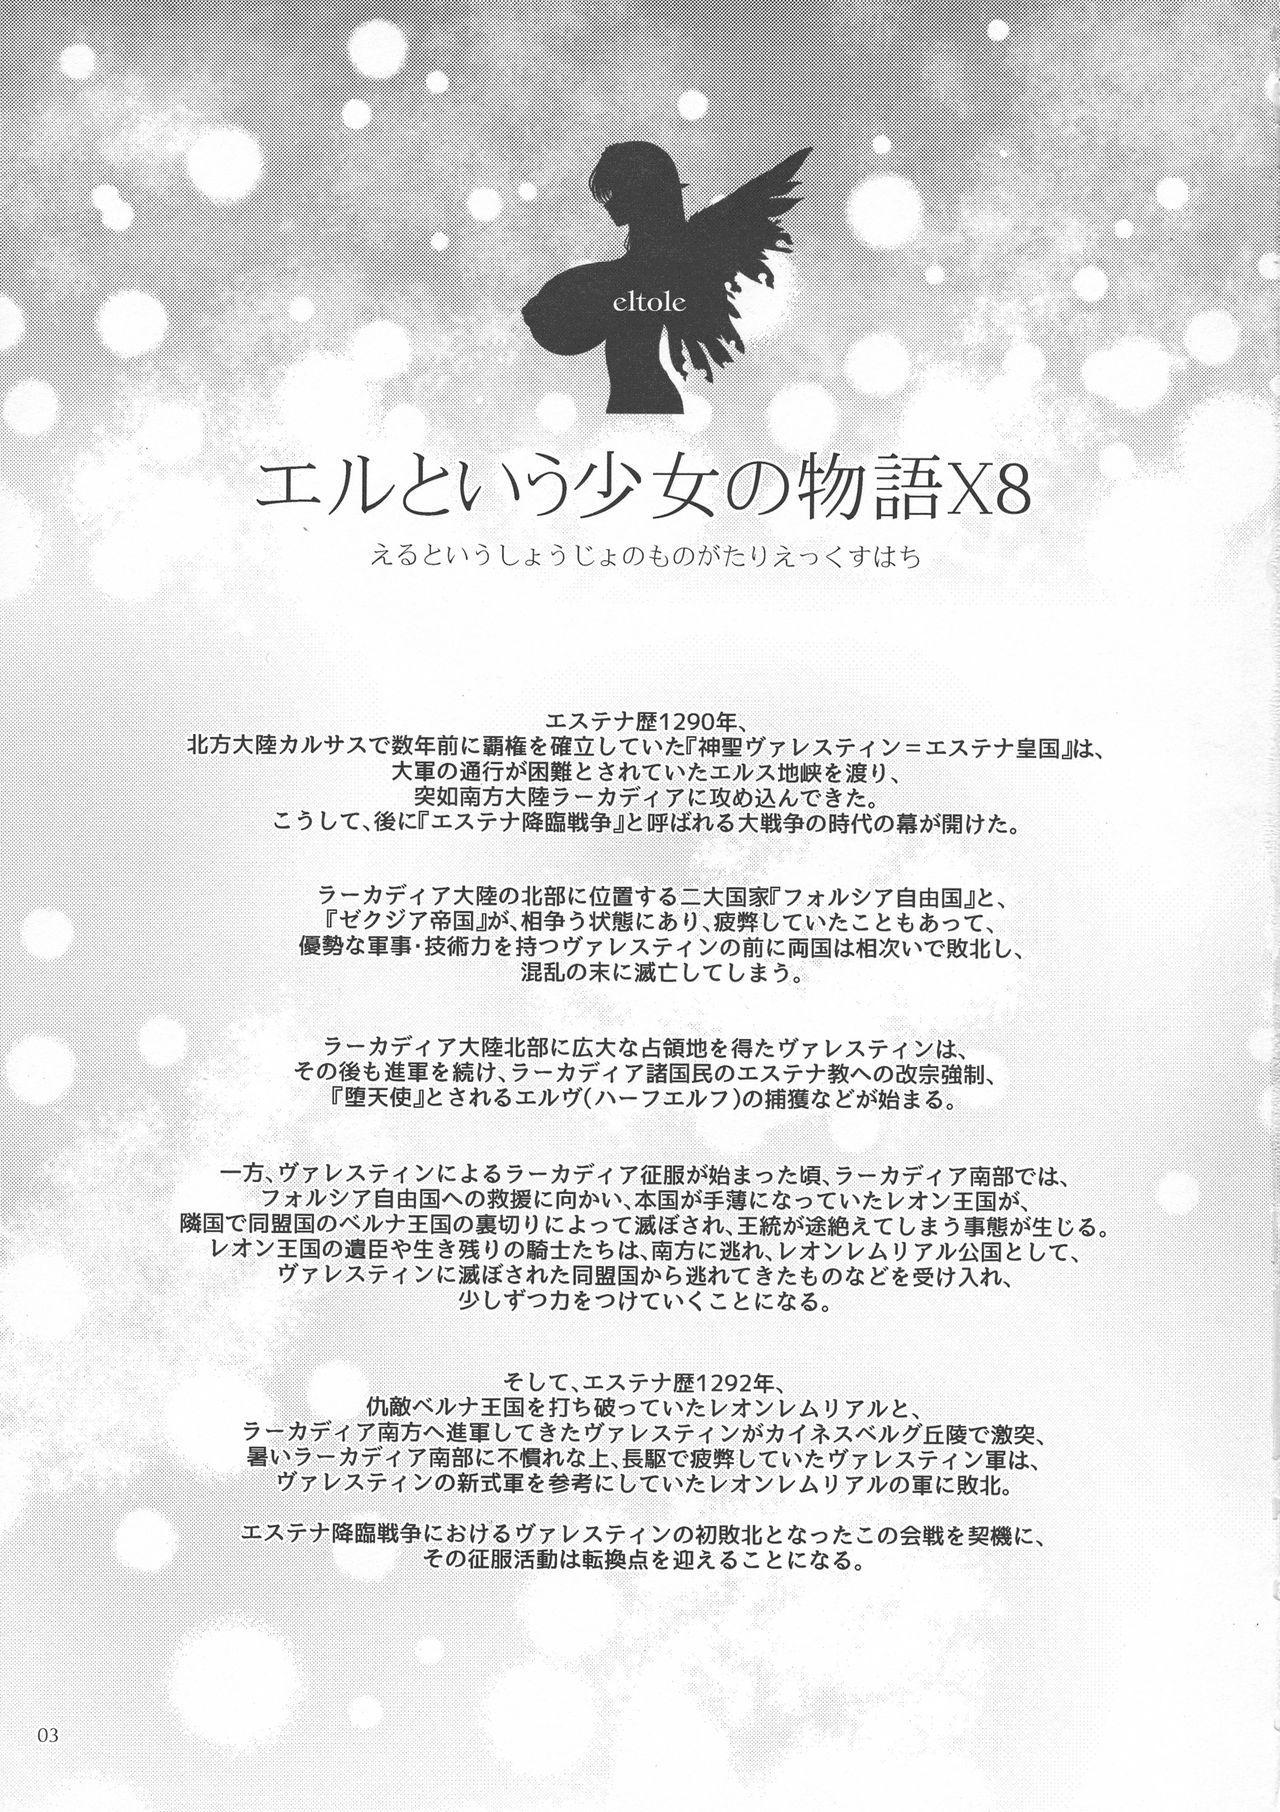 El toiu Shoujo no Monogatari X8 1